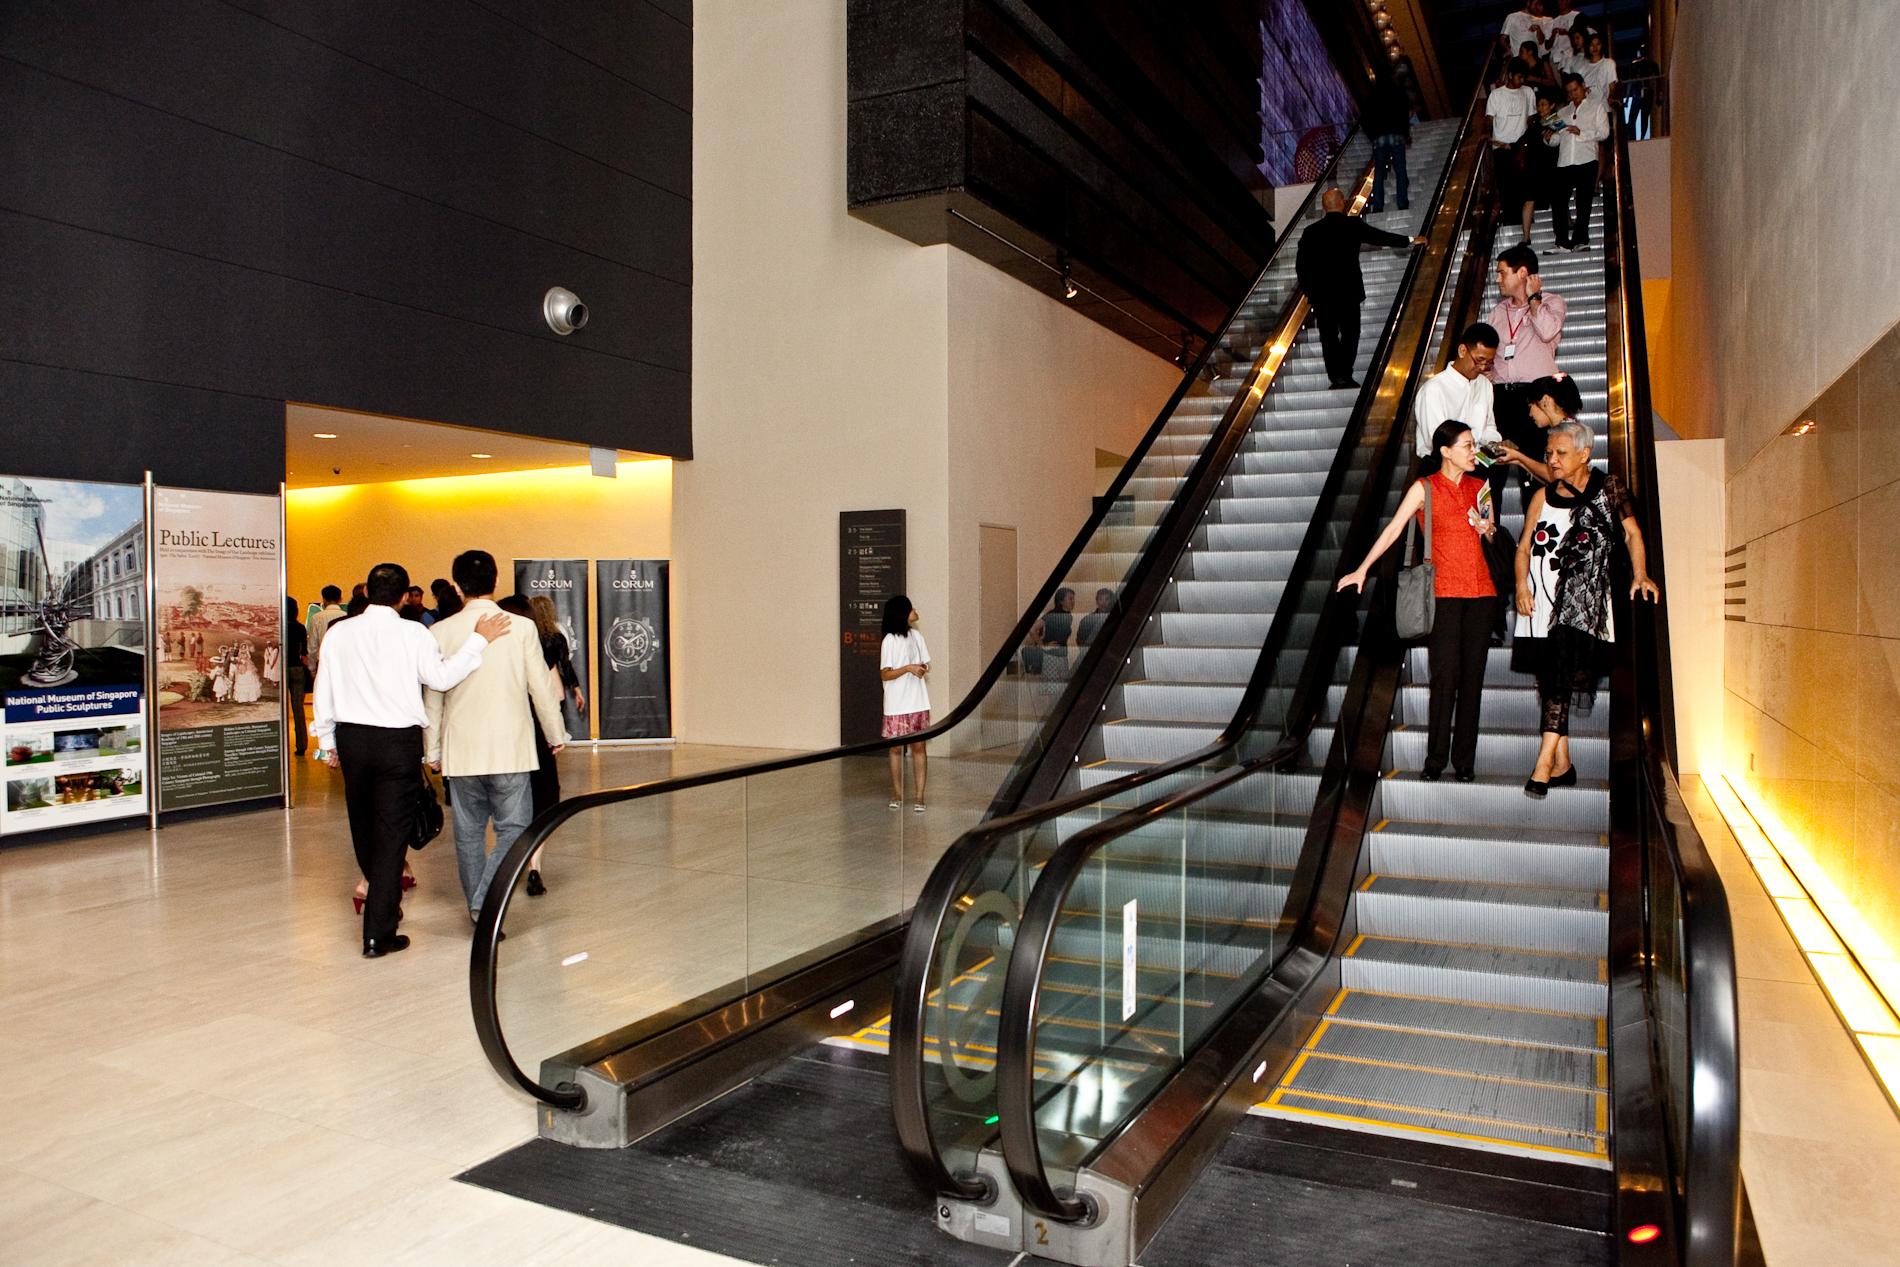 qi-global-2009-sustaible-design-singapore-105.jpg